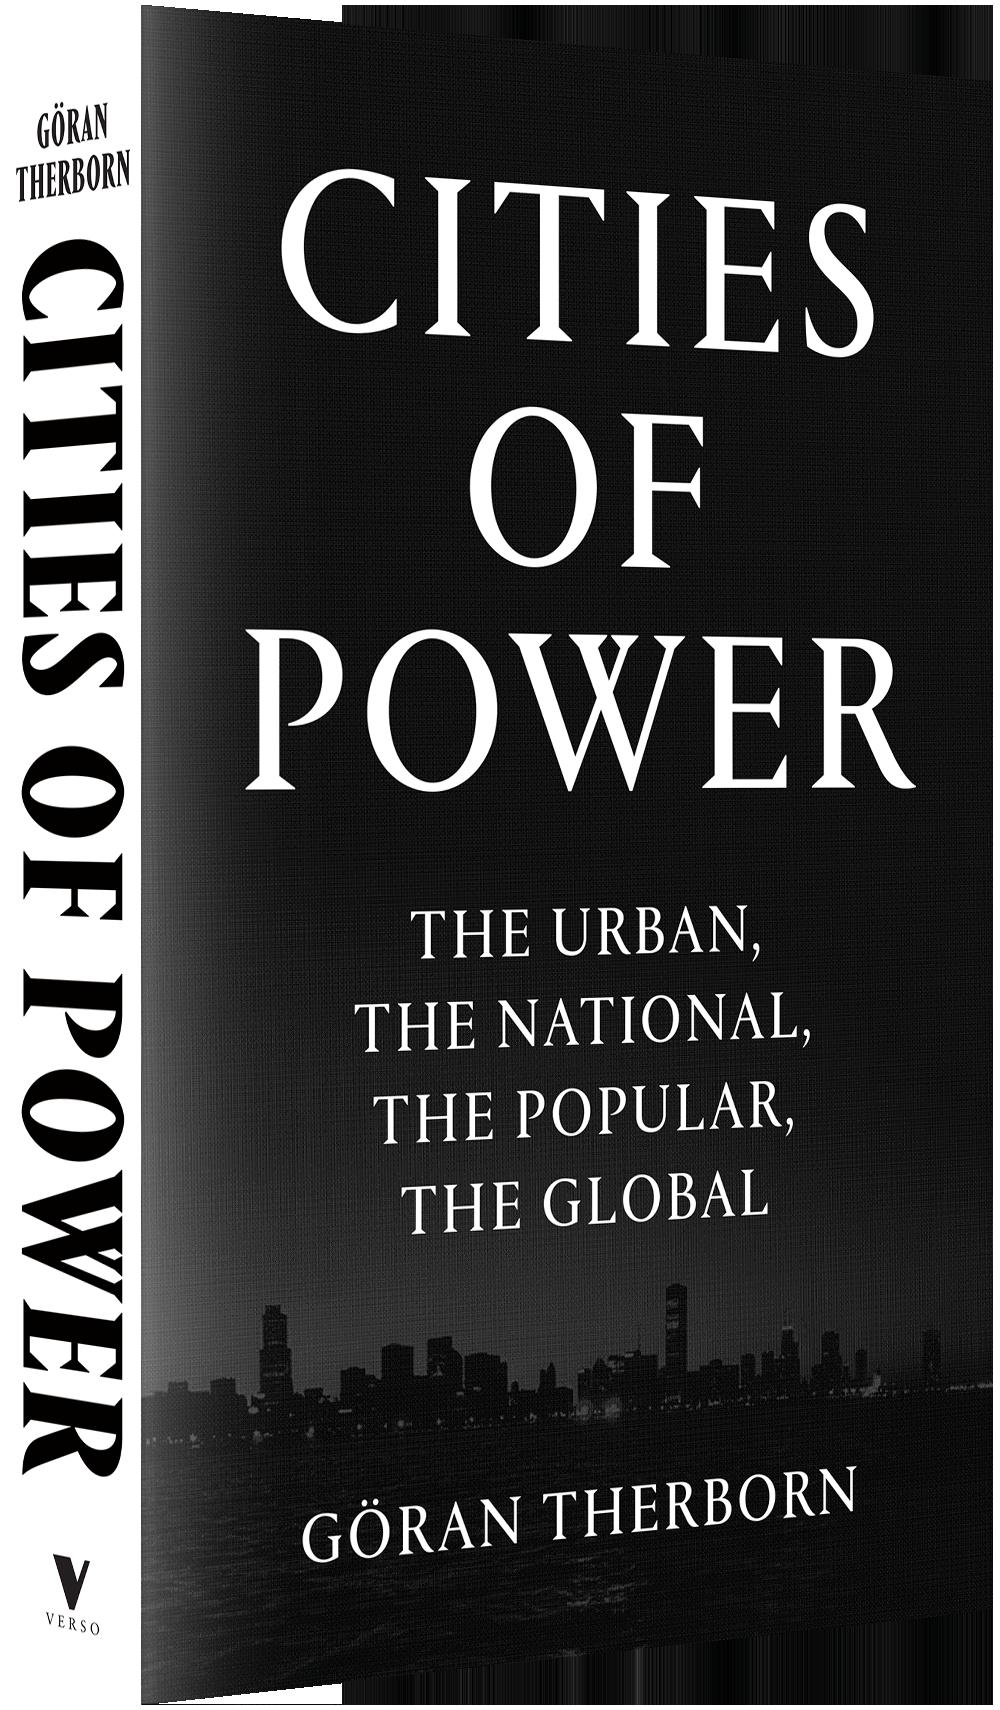 Cities-of-power-pb